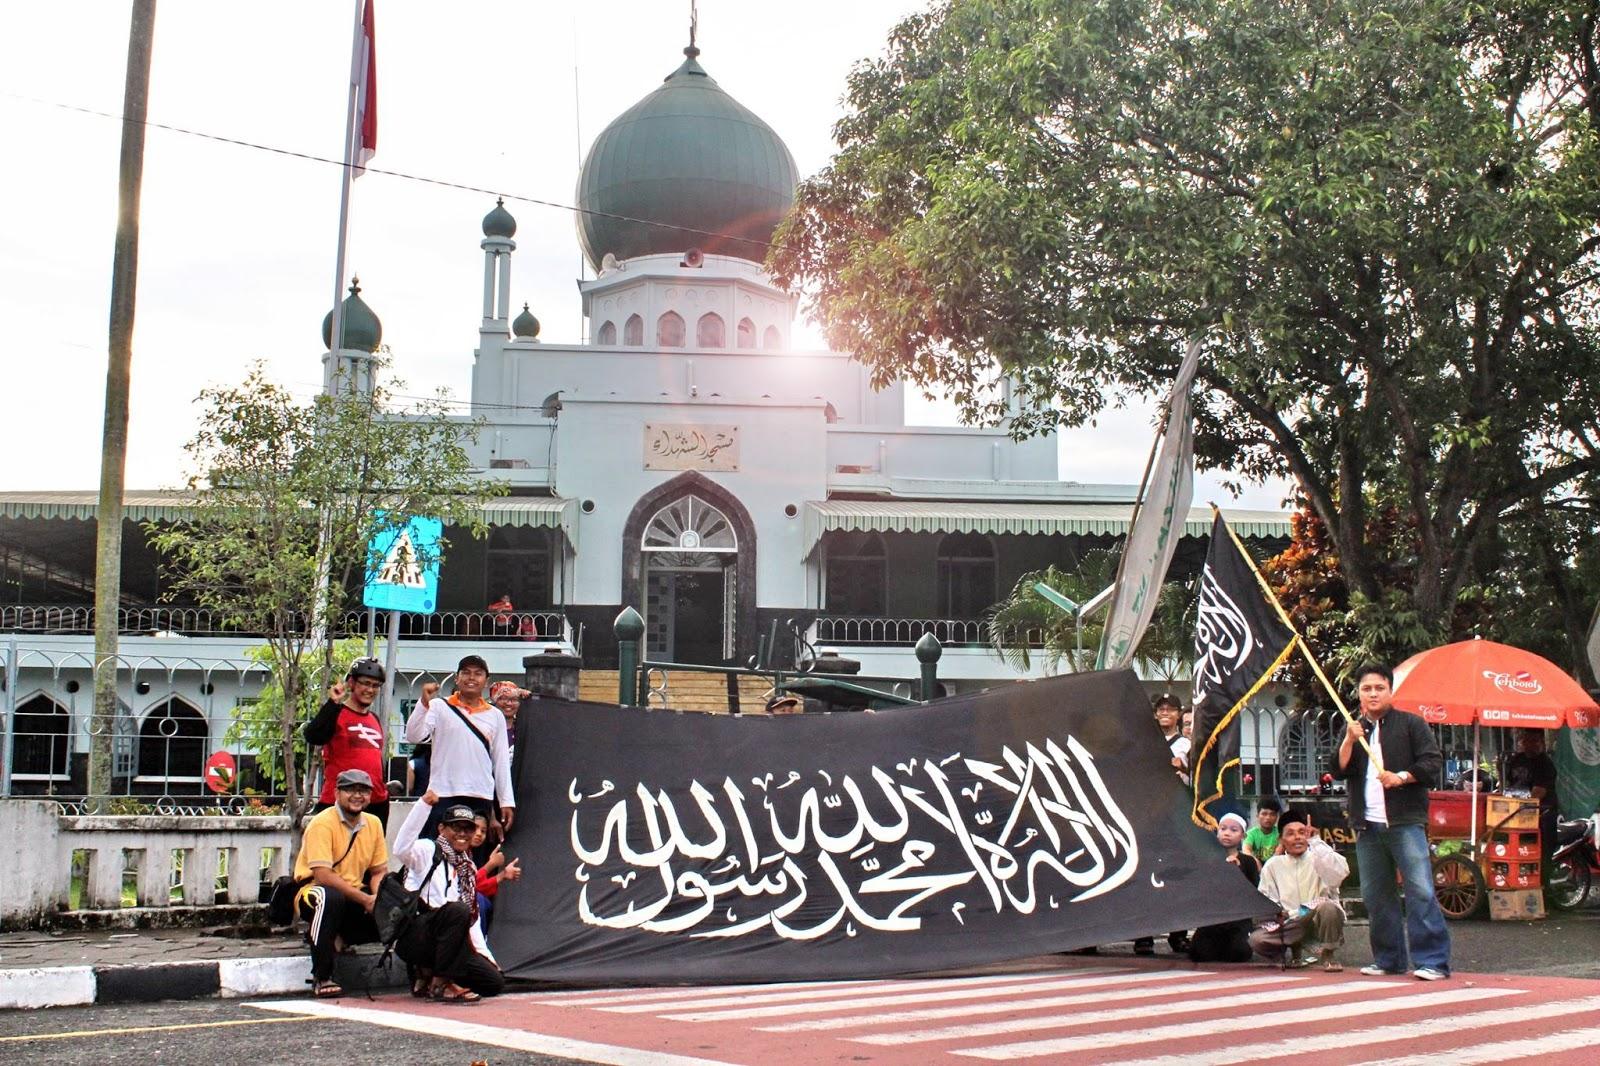 Dakwah Poros Hidup Kibaran Panjirasulullah Masjid Syuhada Yogyakarta Kota